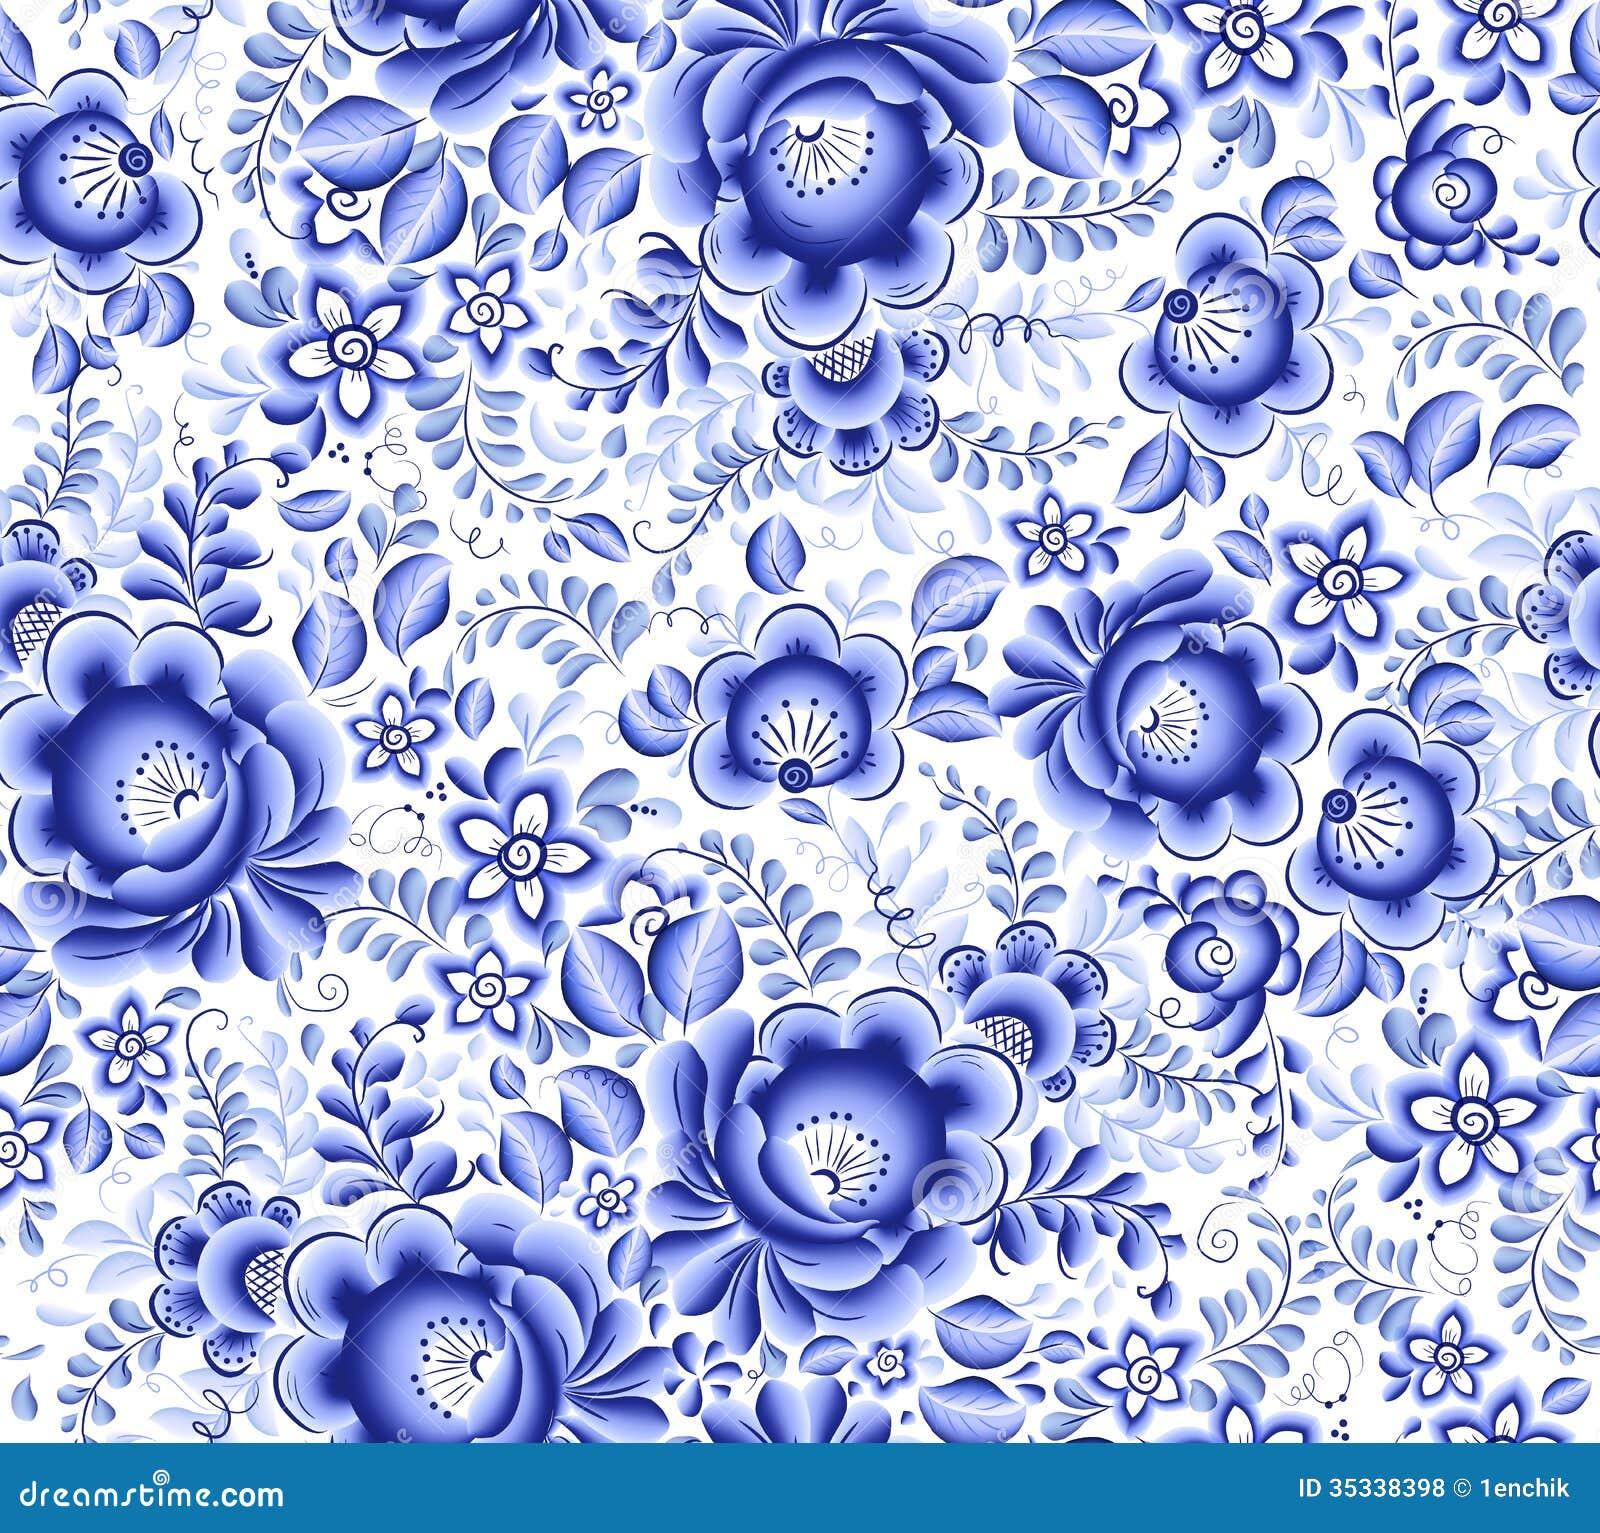 Vintage floral pattern seamless